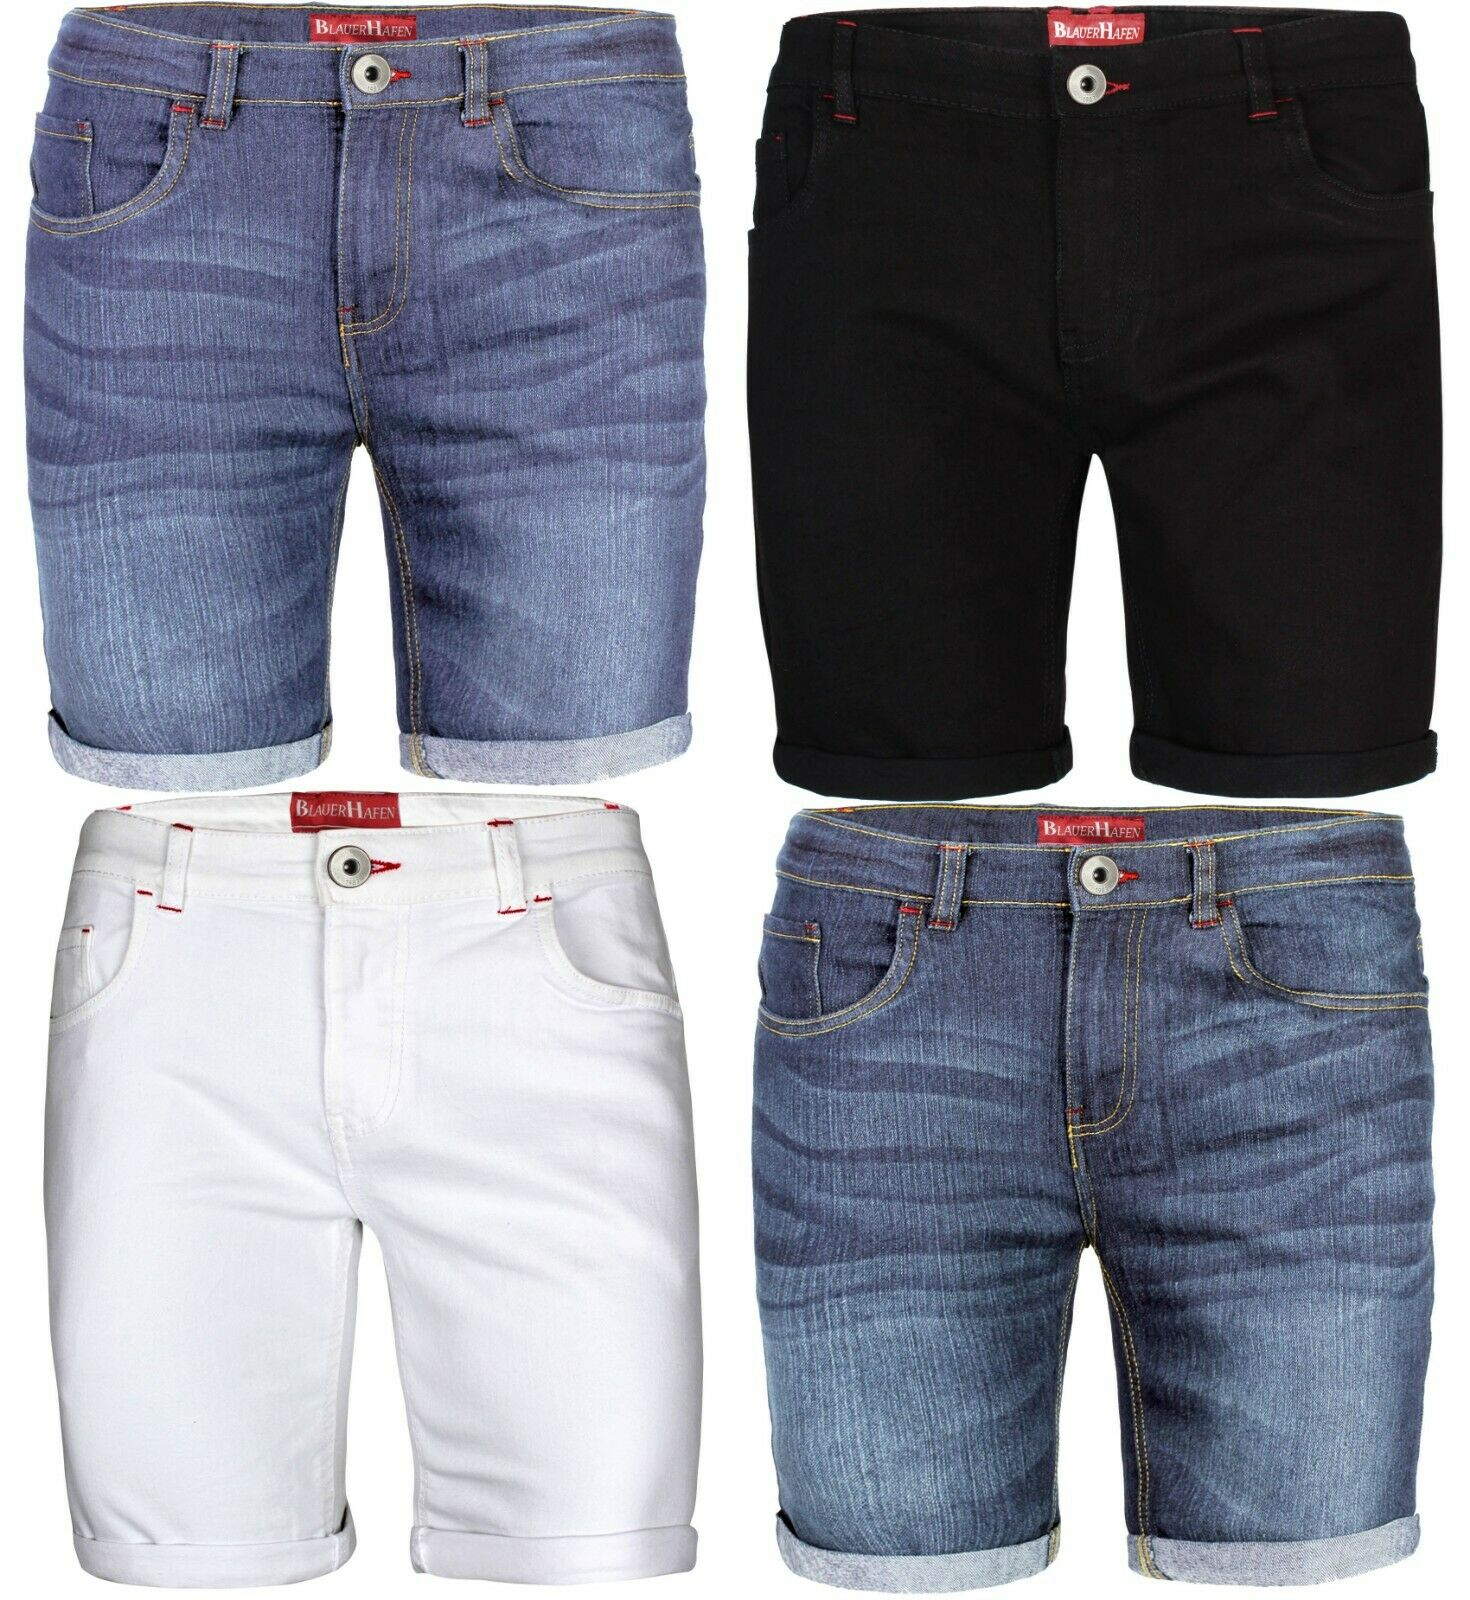 Herren Designer Jeans Shorts Elasthan Kurze Hose SuperFlex Slim Fit Sommer Denim